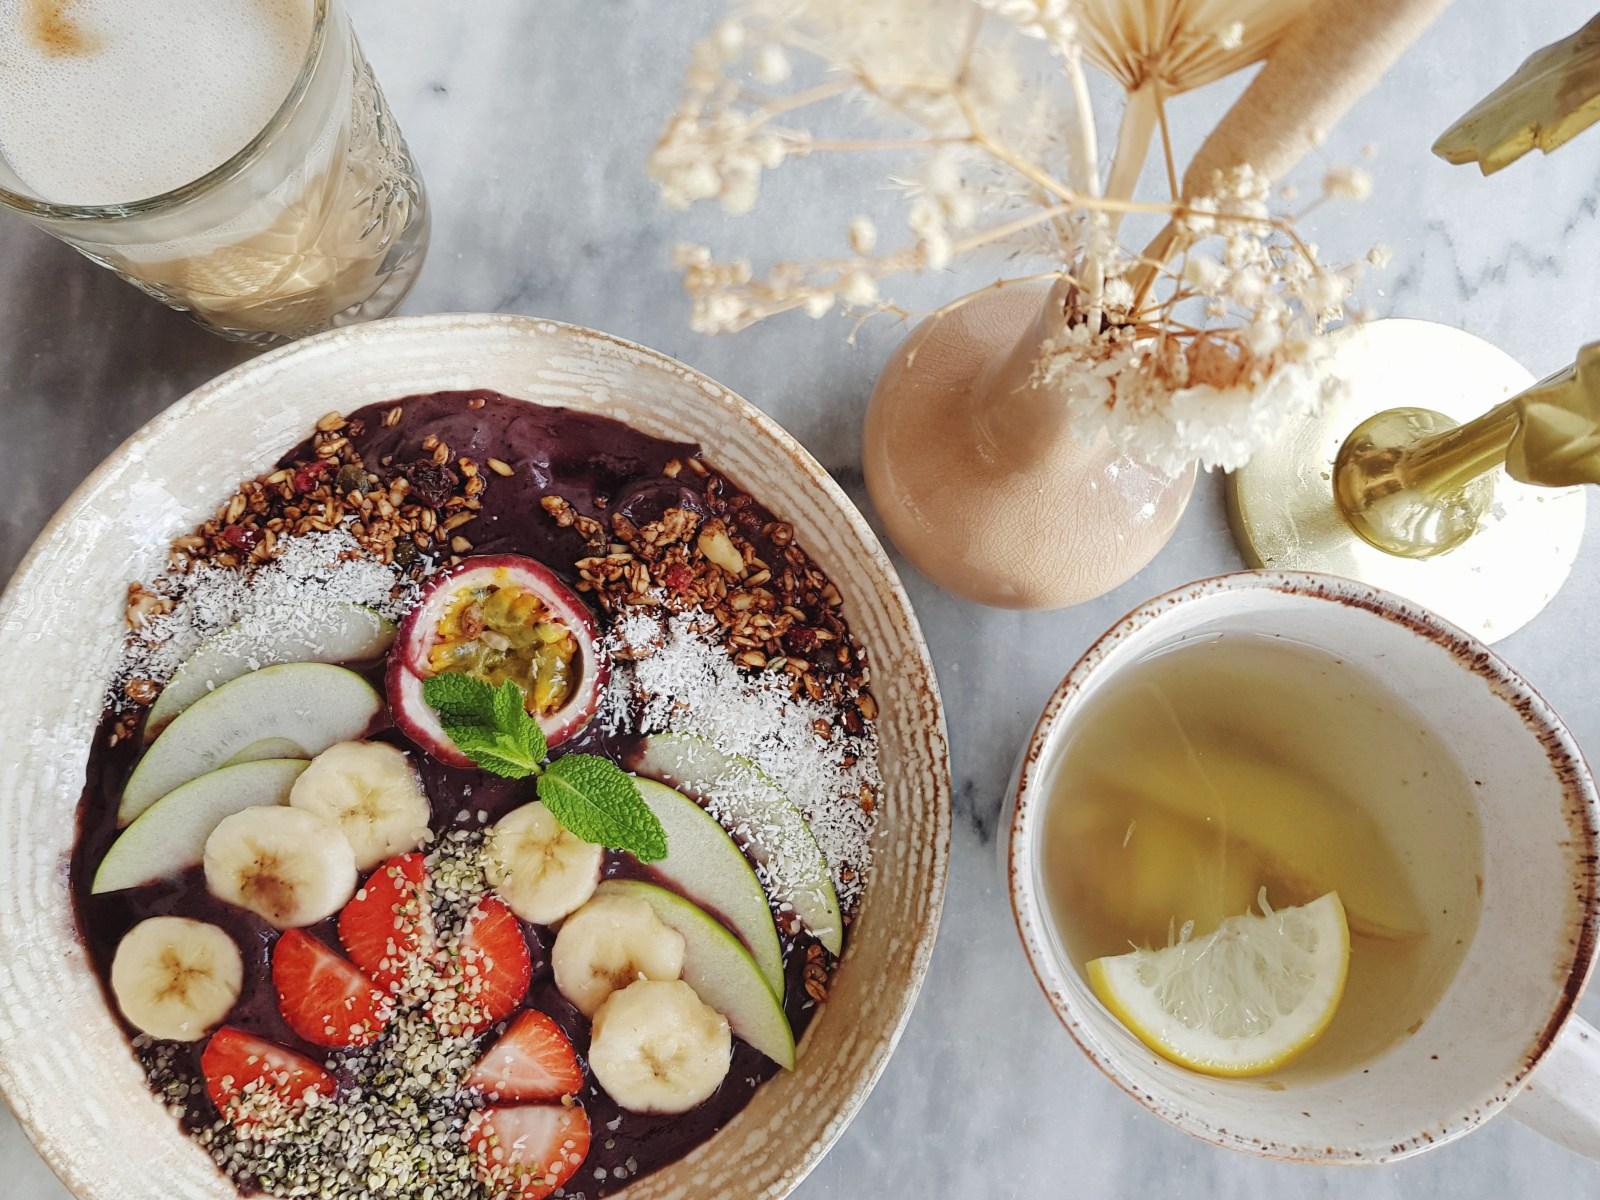 Waar eet je de lekkerste Acai Bowls?